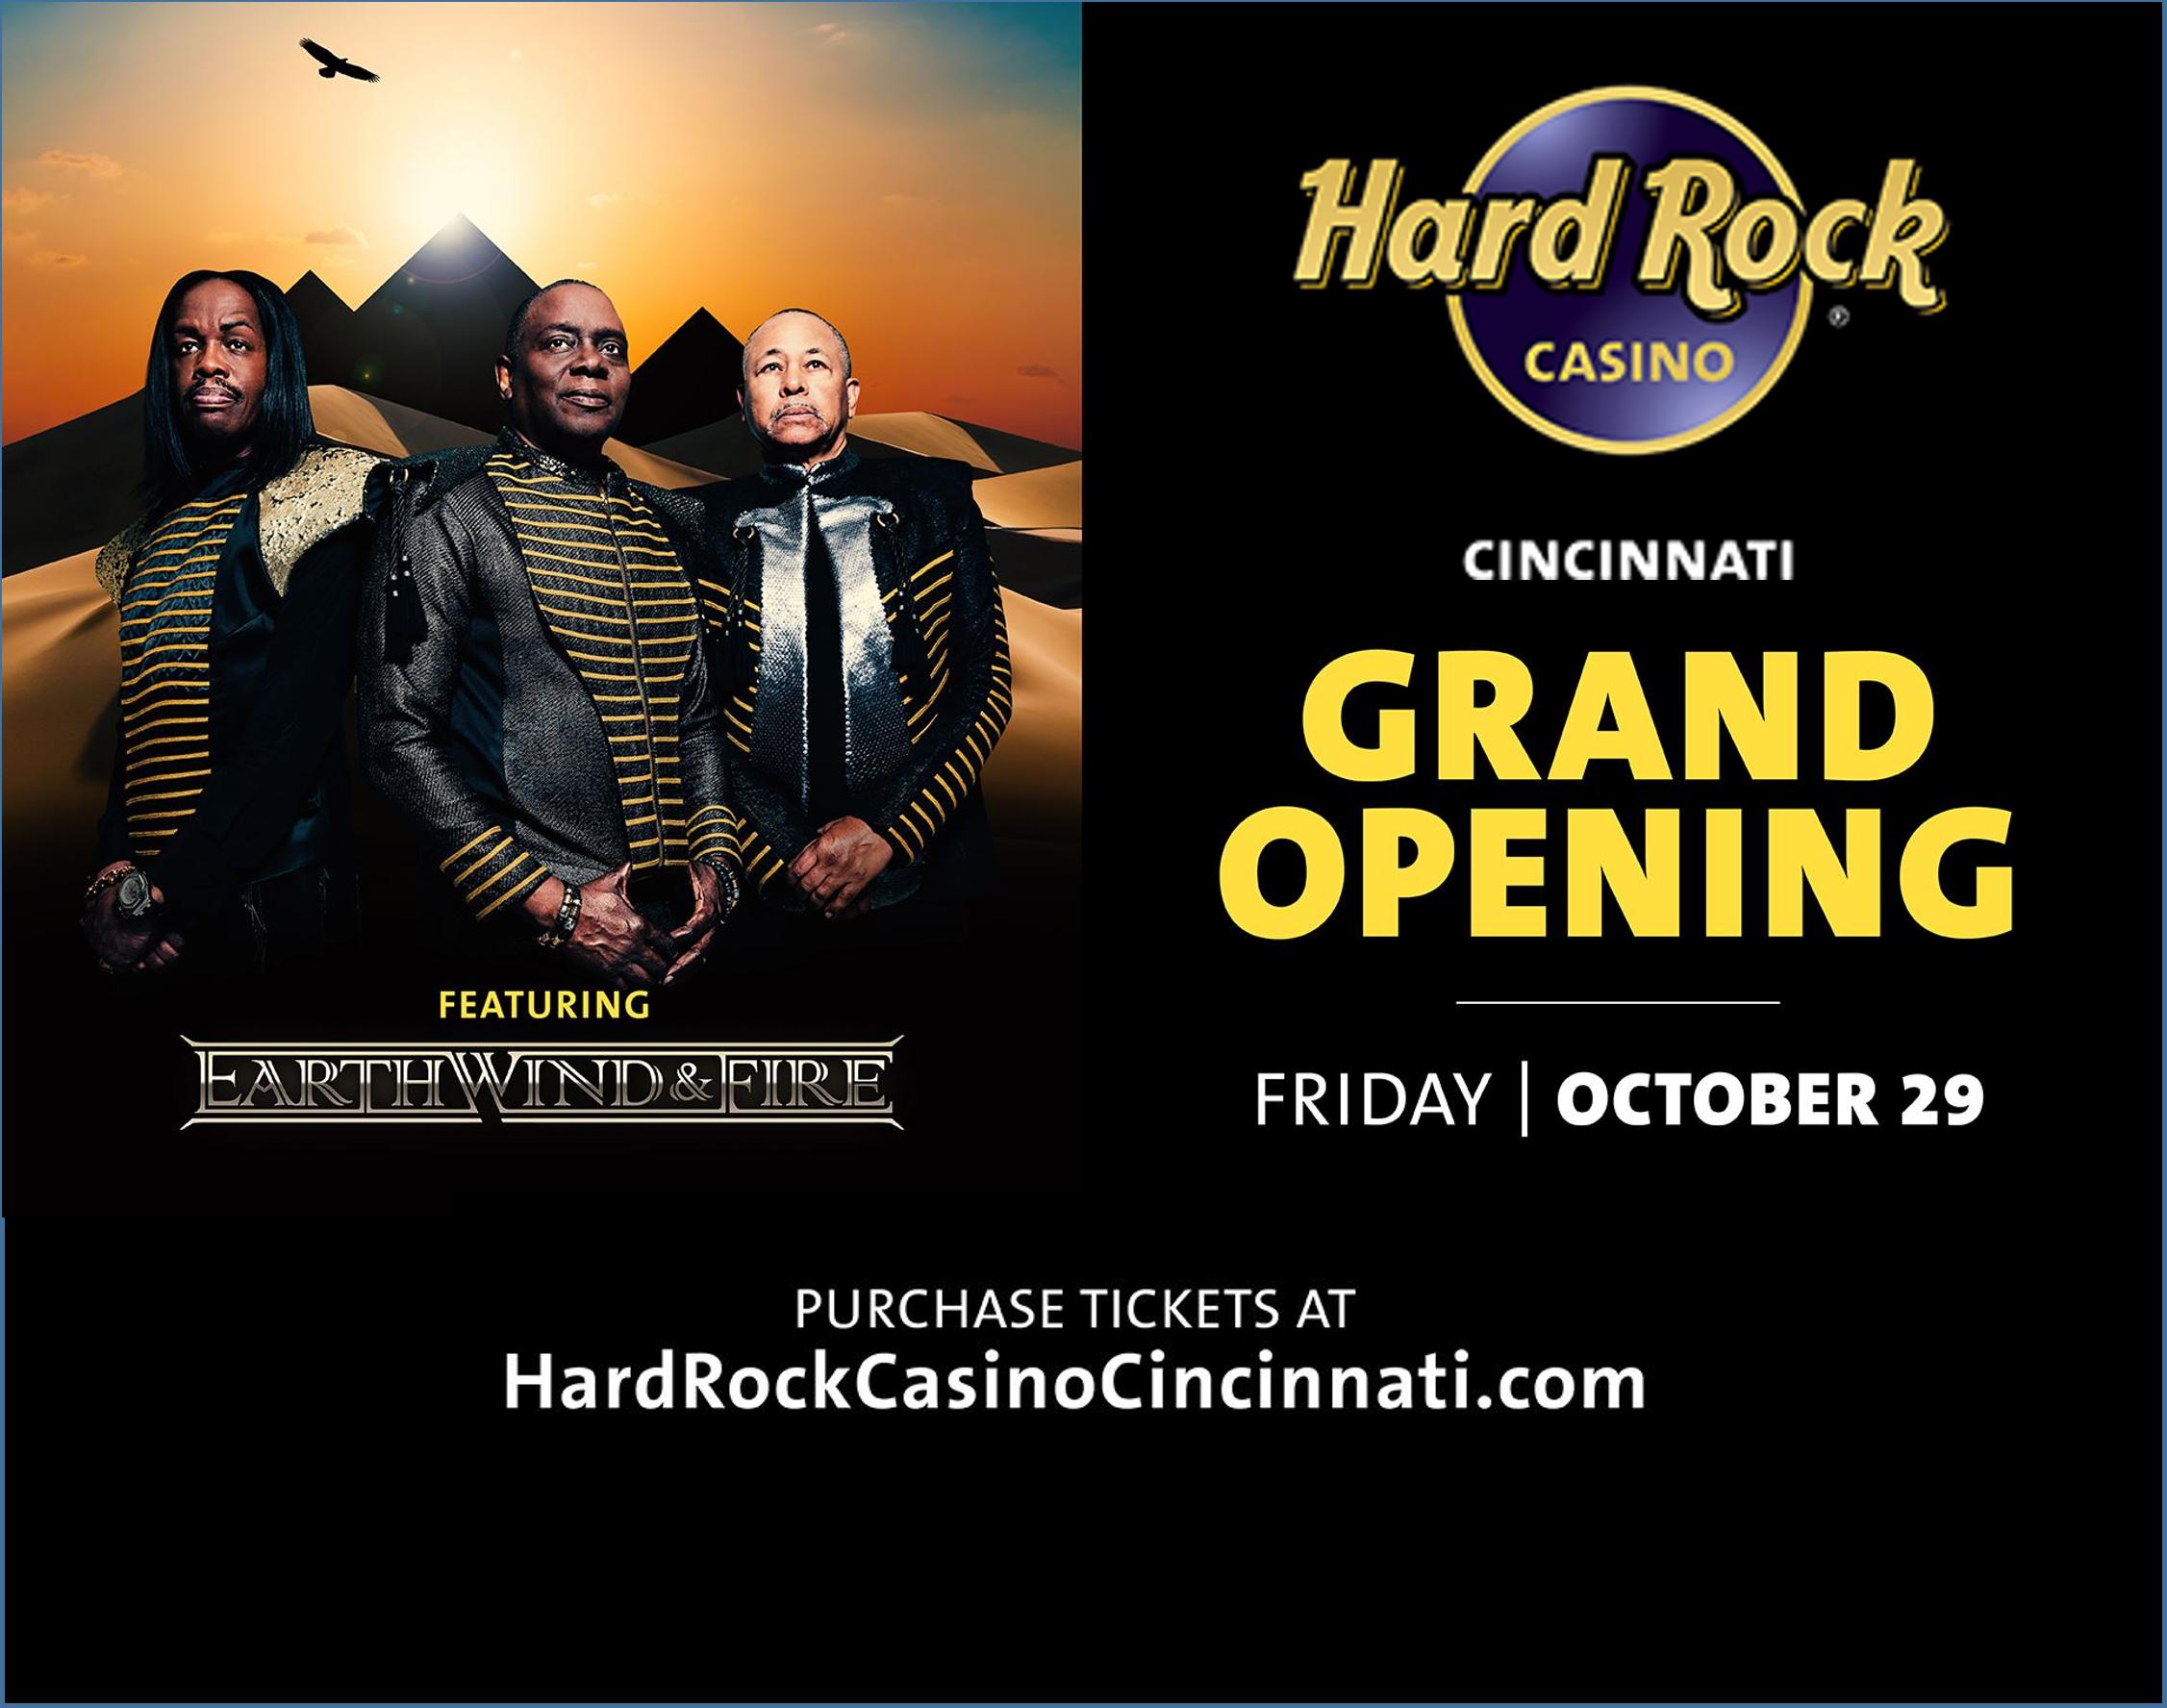 Hard Rock Cincinnati – Grand Opening